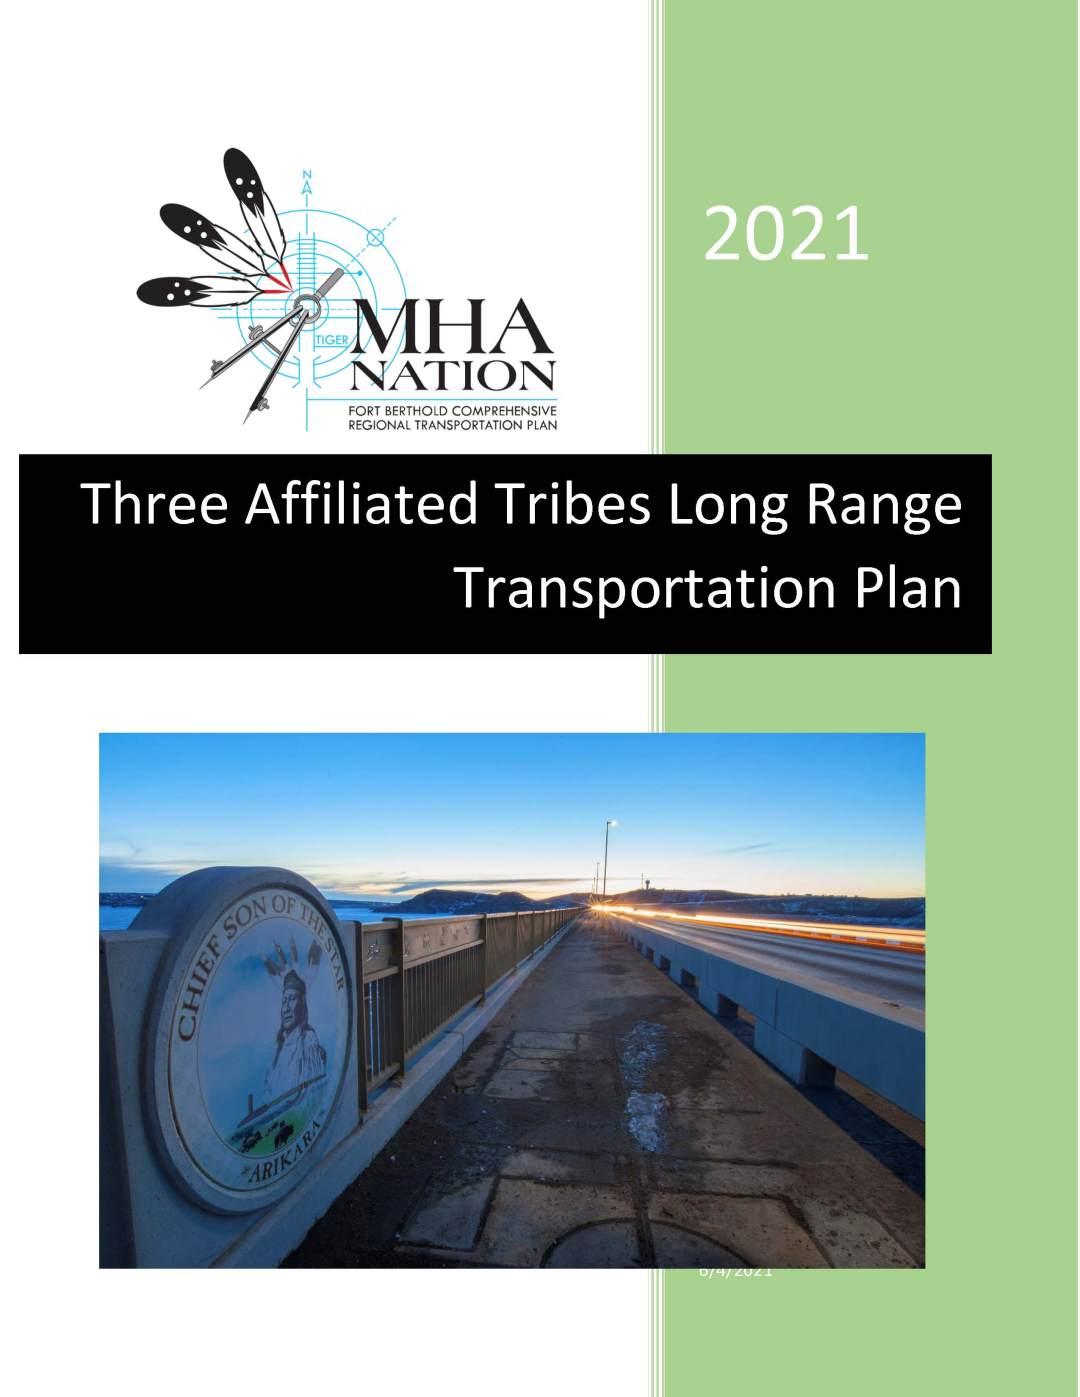 Final 2021 MHA Long Range Transportation Plan